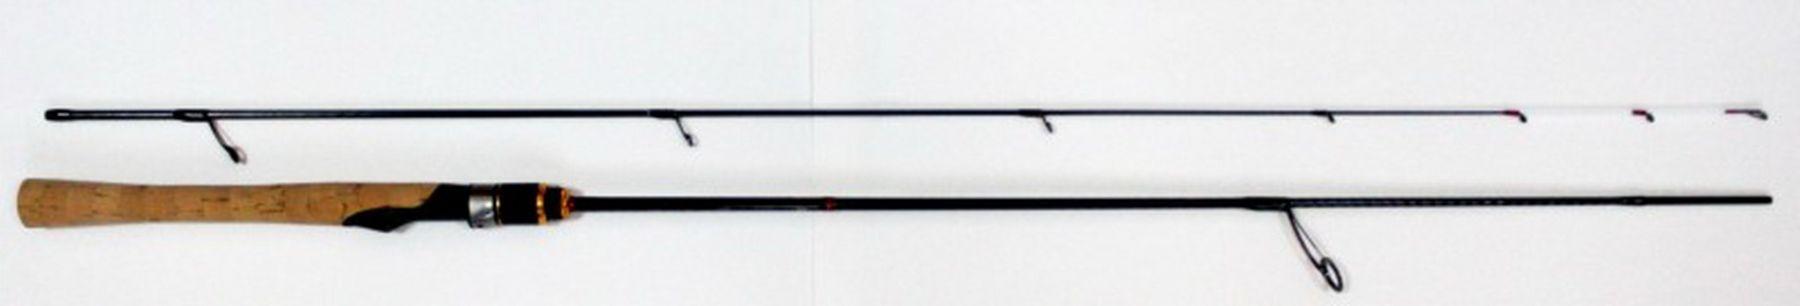 Cпиннинг Mifine Camara Jig Spin 2.05 м / 0.5-8г / арт 11317-205